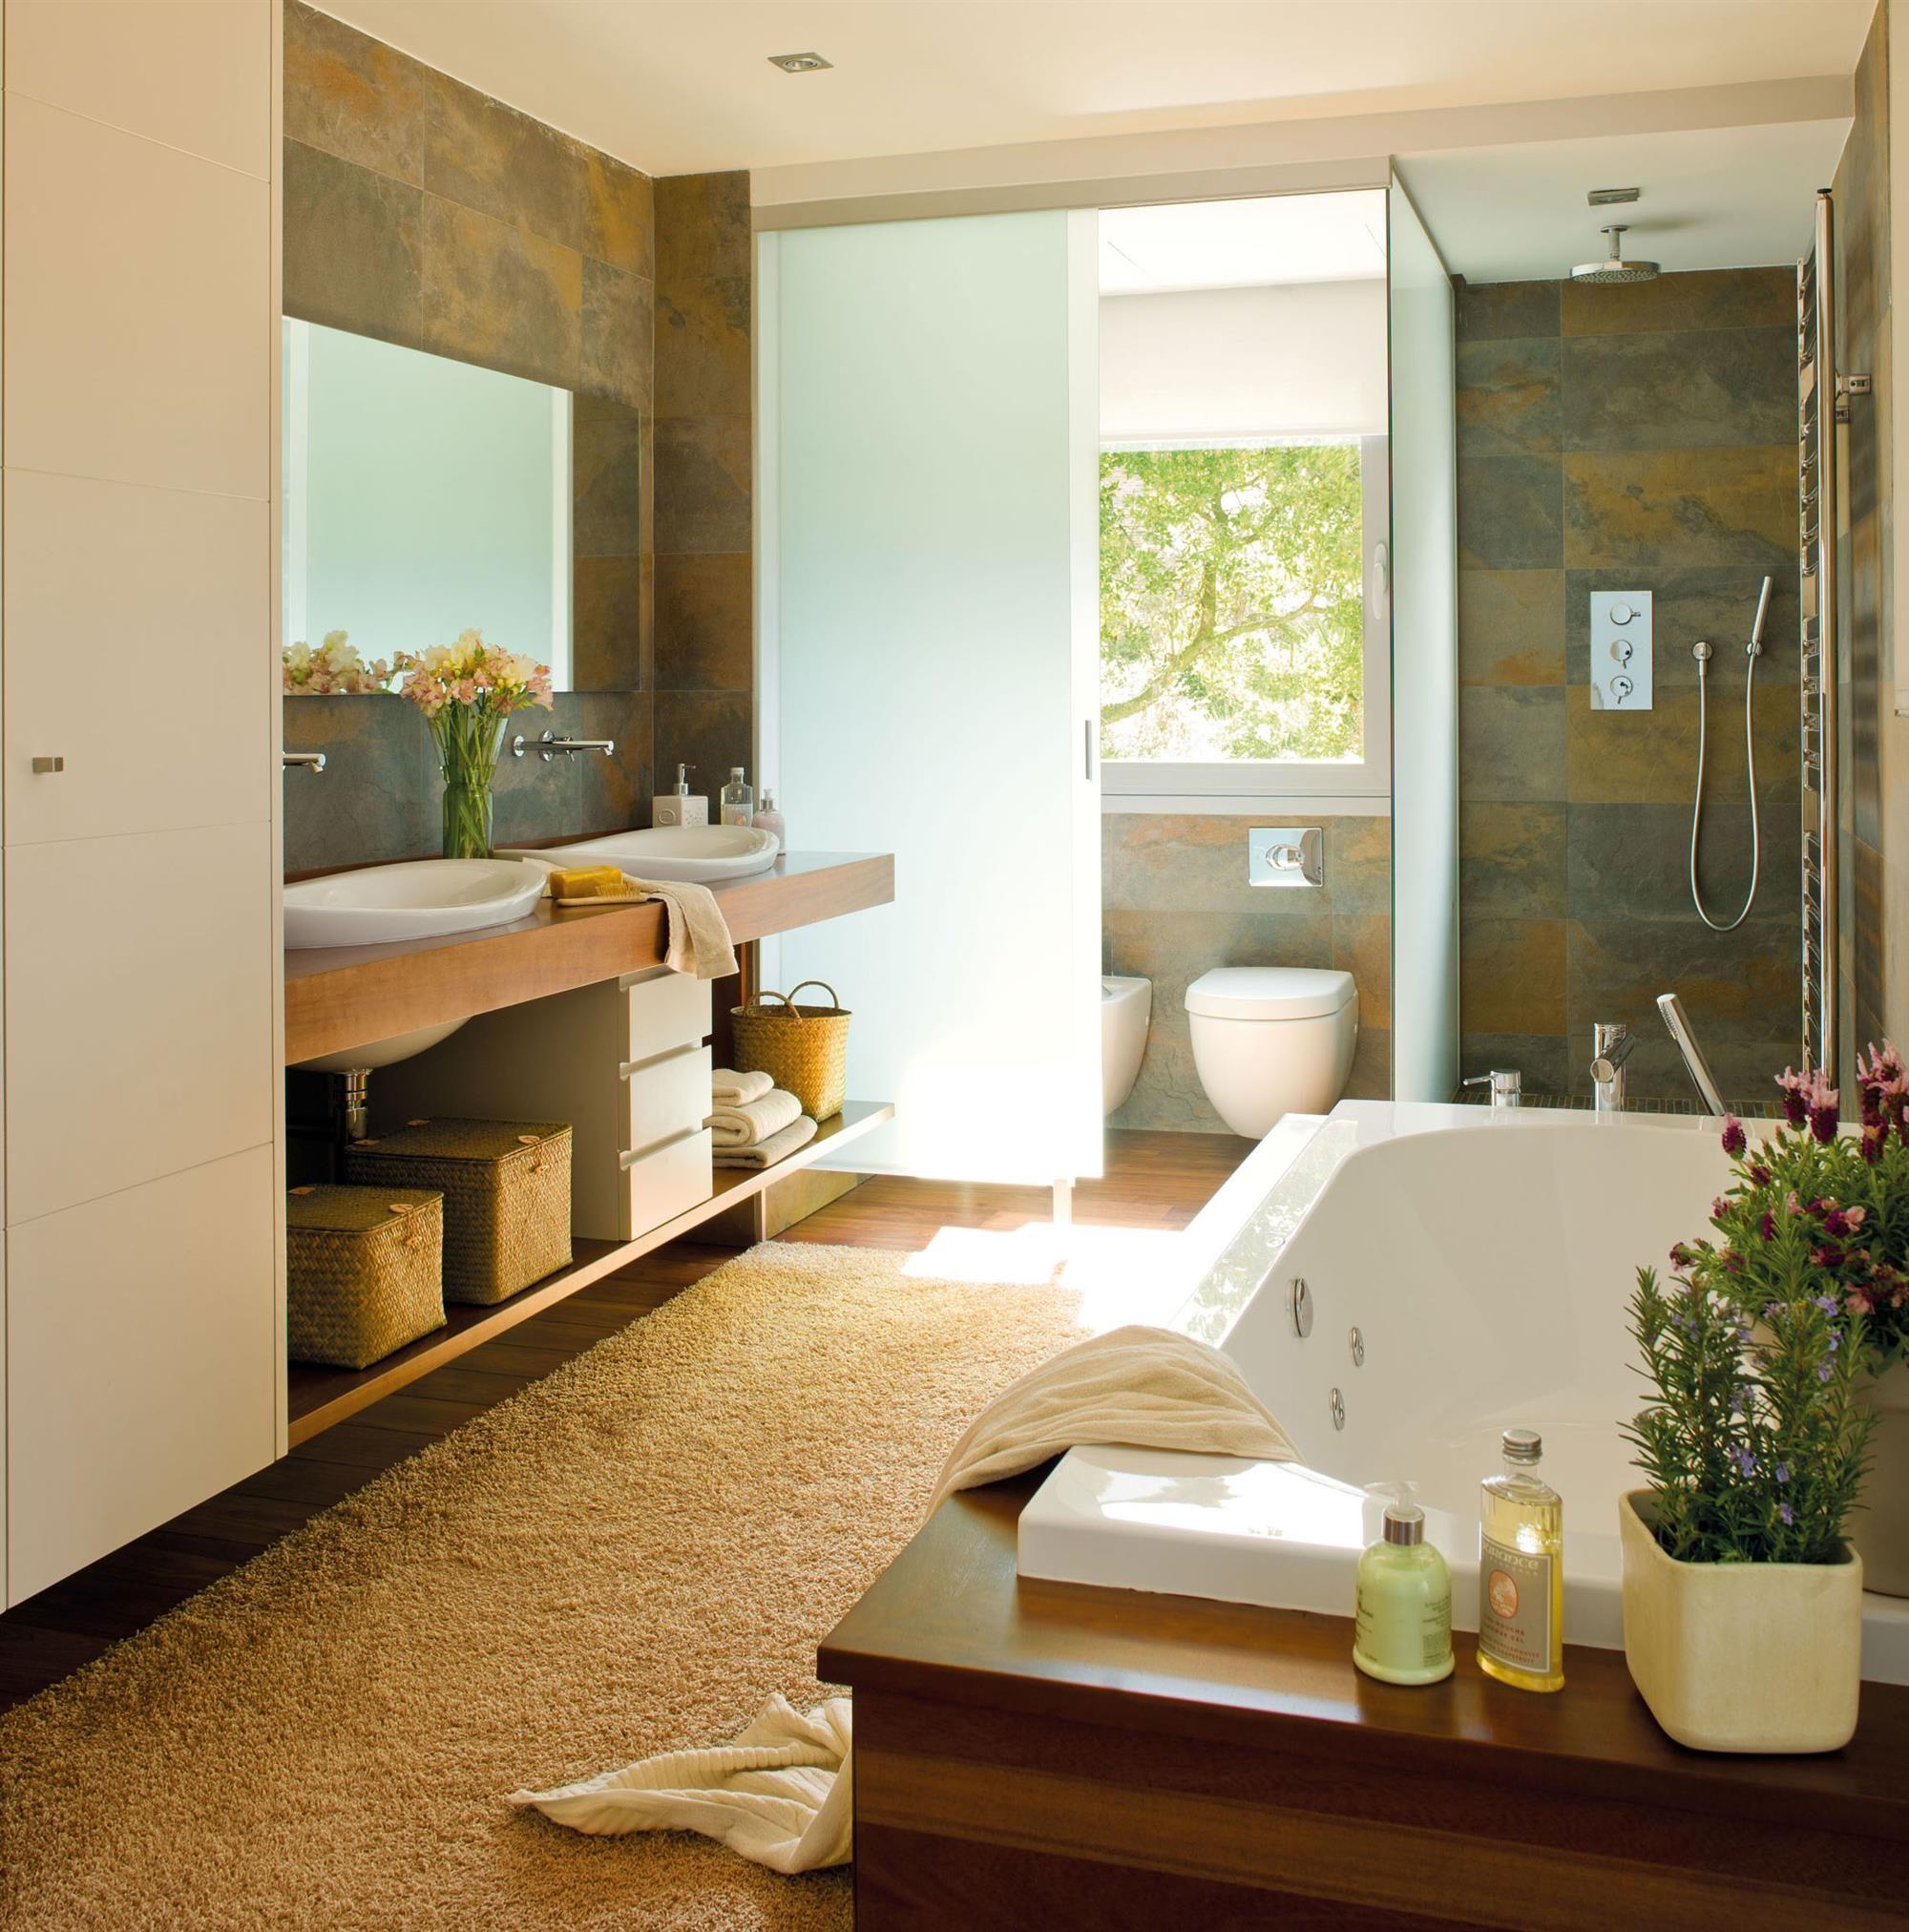 Test: ¿Tu baño ideal es con bañera o ducha? en 2020 ...